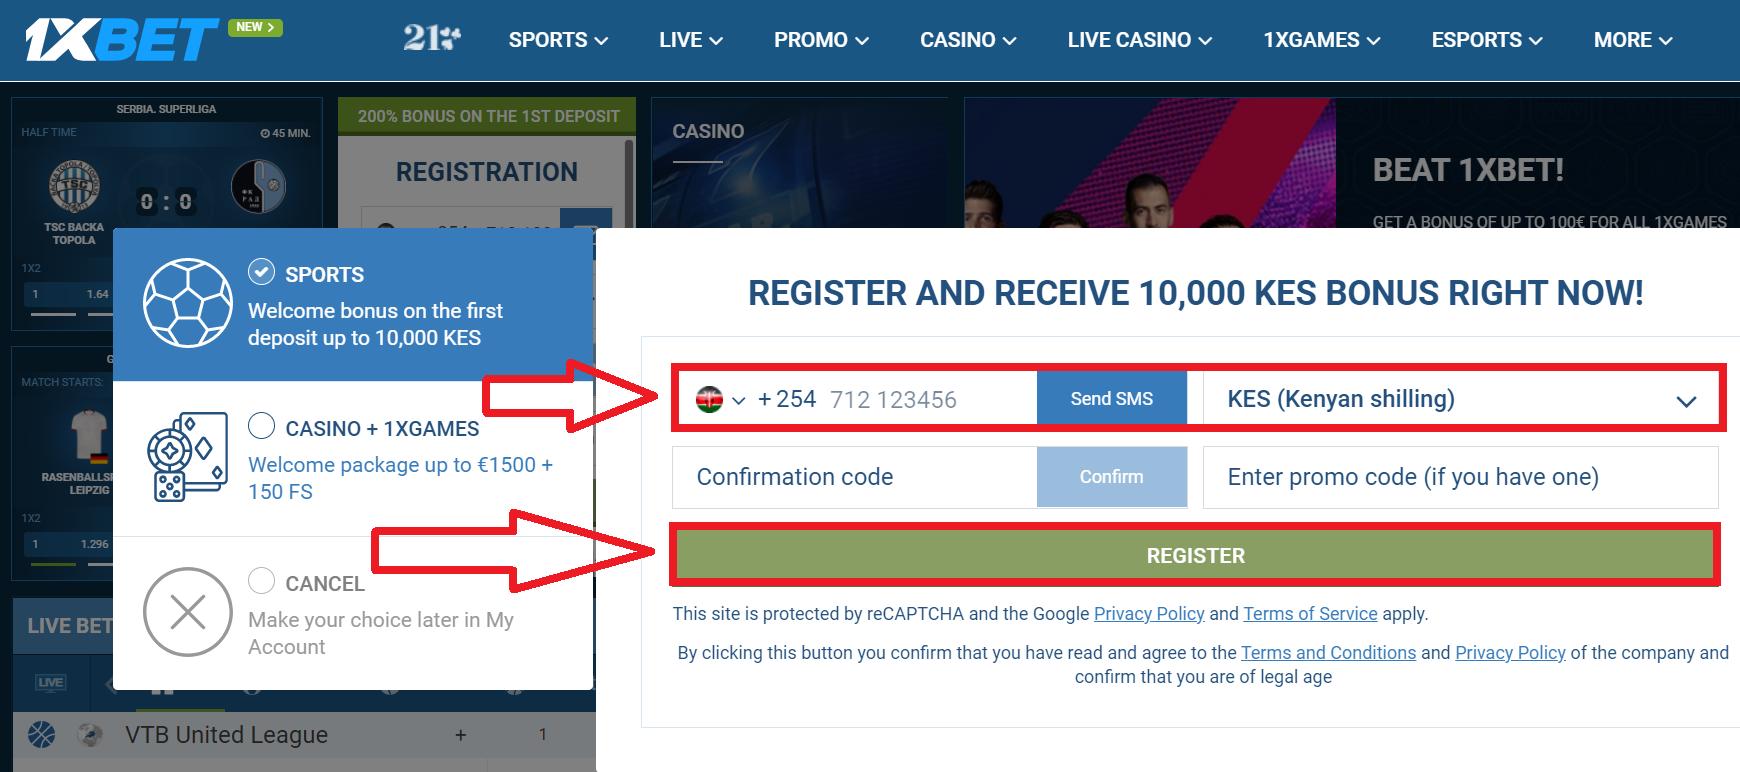 Fast 1xbet Kenya registration